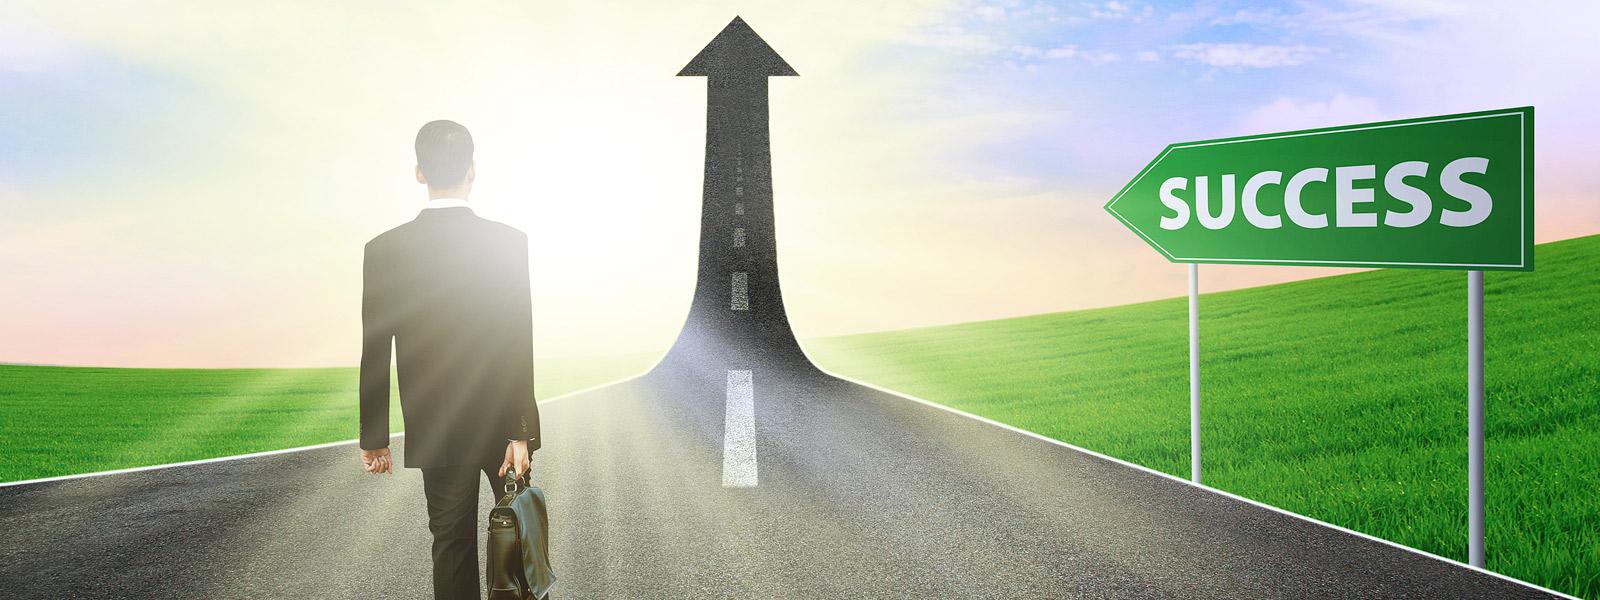 a-fresh-view-of-success Амжилт хэнд ирдэг вэ?